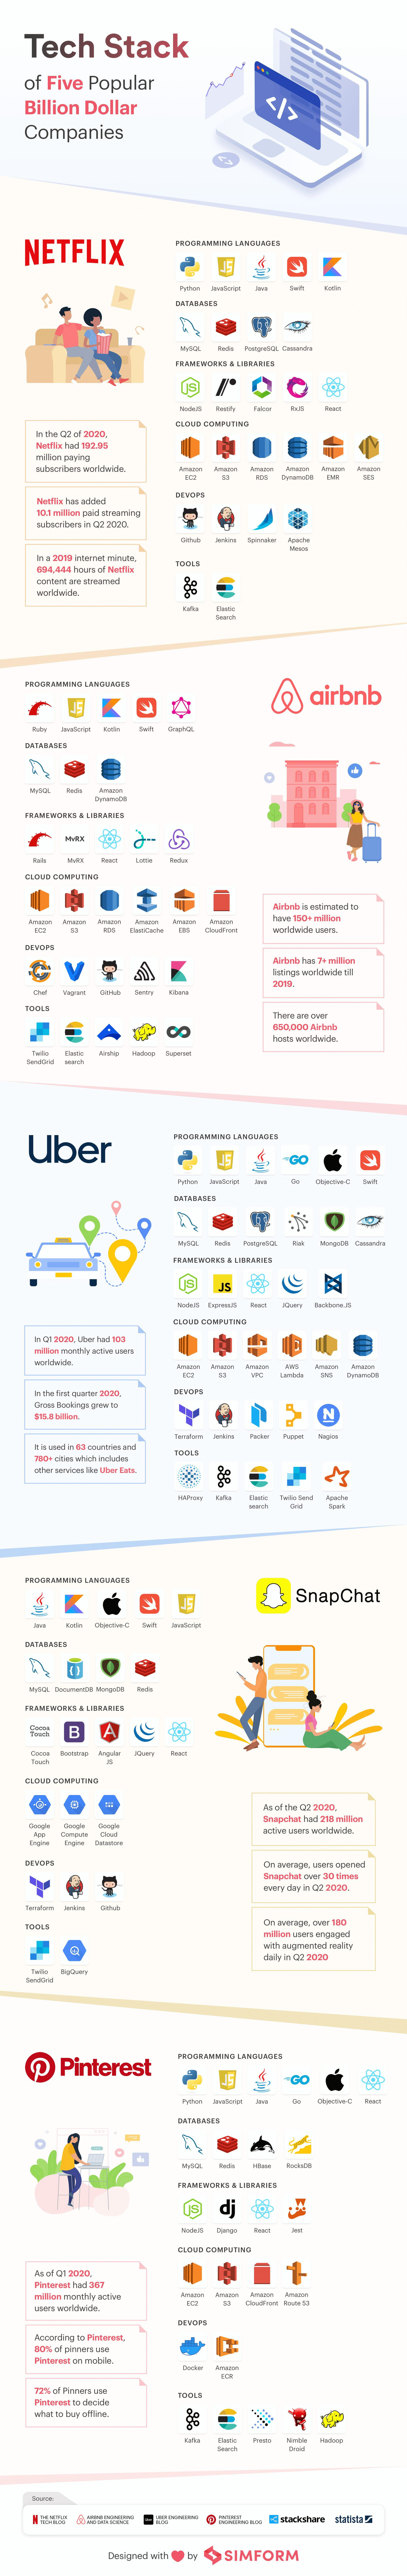 Tech Stack of Tech Companies